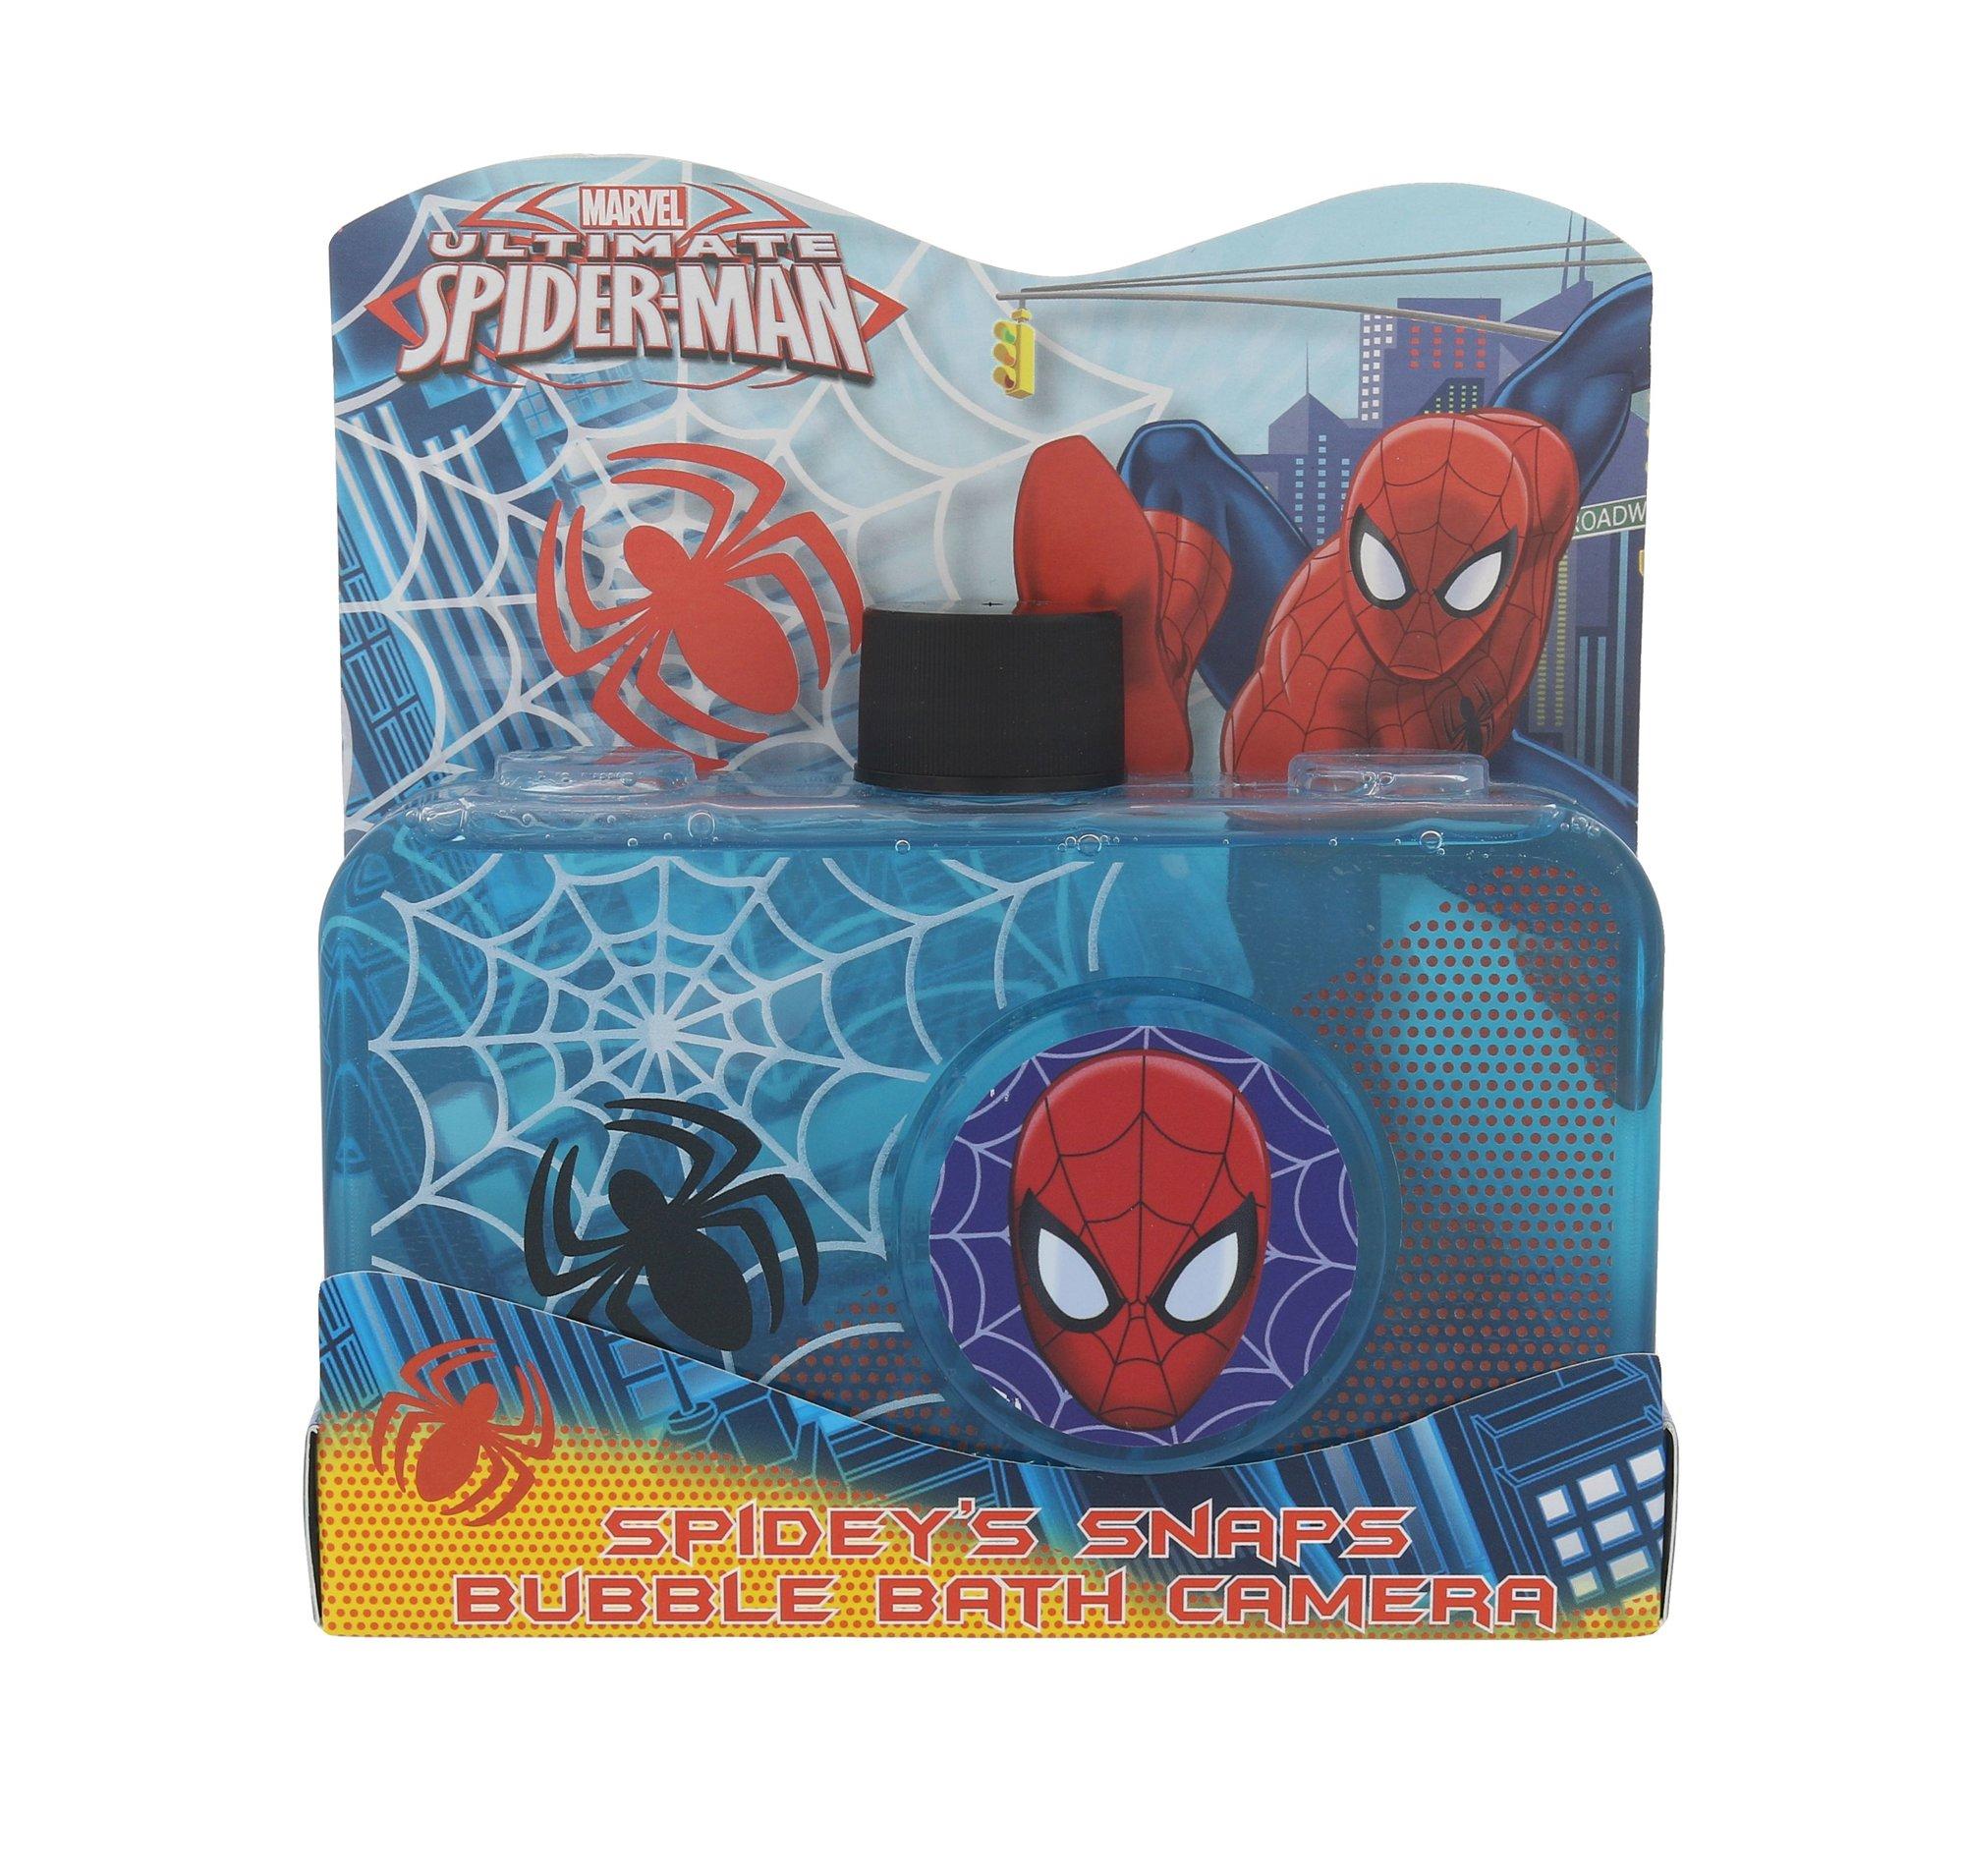 Marvel Spiderman Cosmetic 300ml